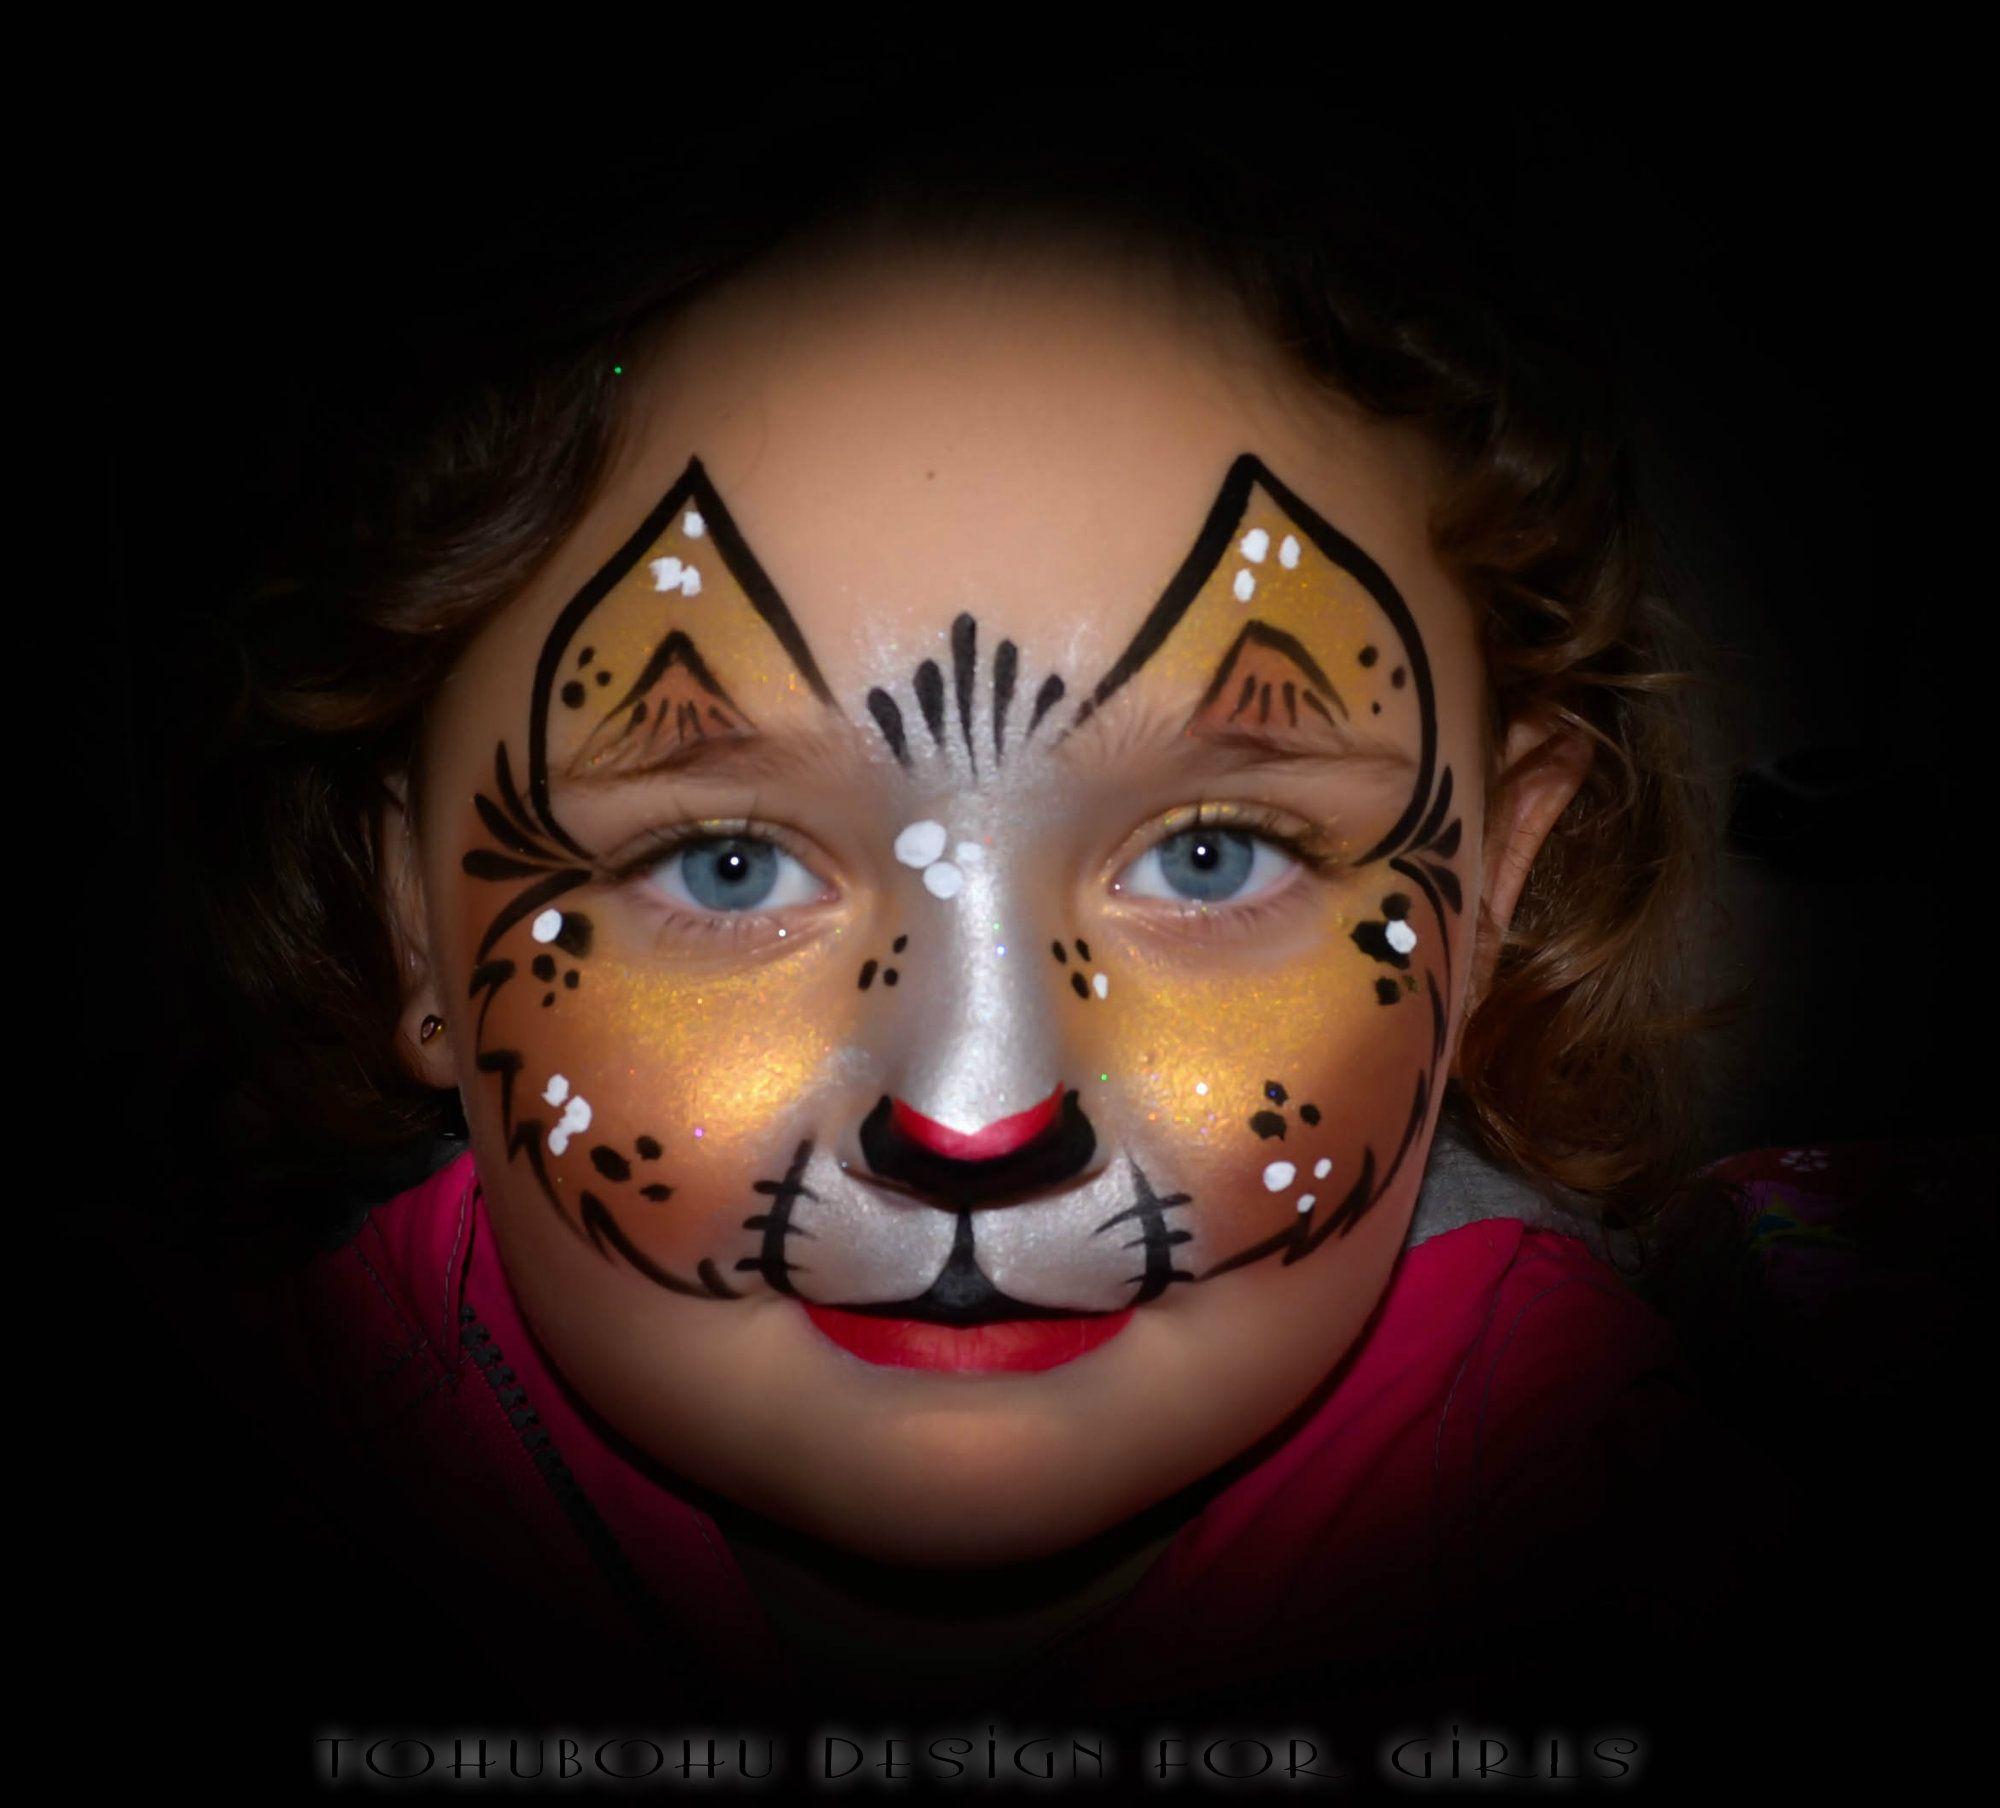 kitty maquillage chats pour enfants sages make up for. Black Bedroom Furniture Sets. Home Design Ideas